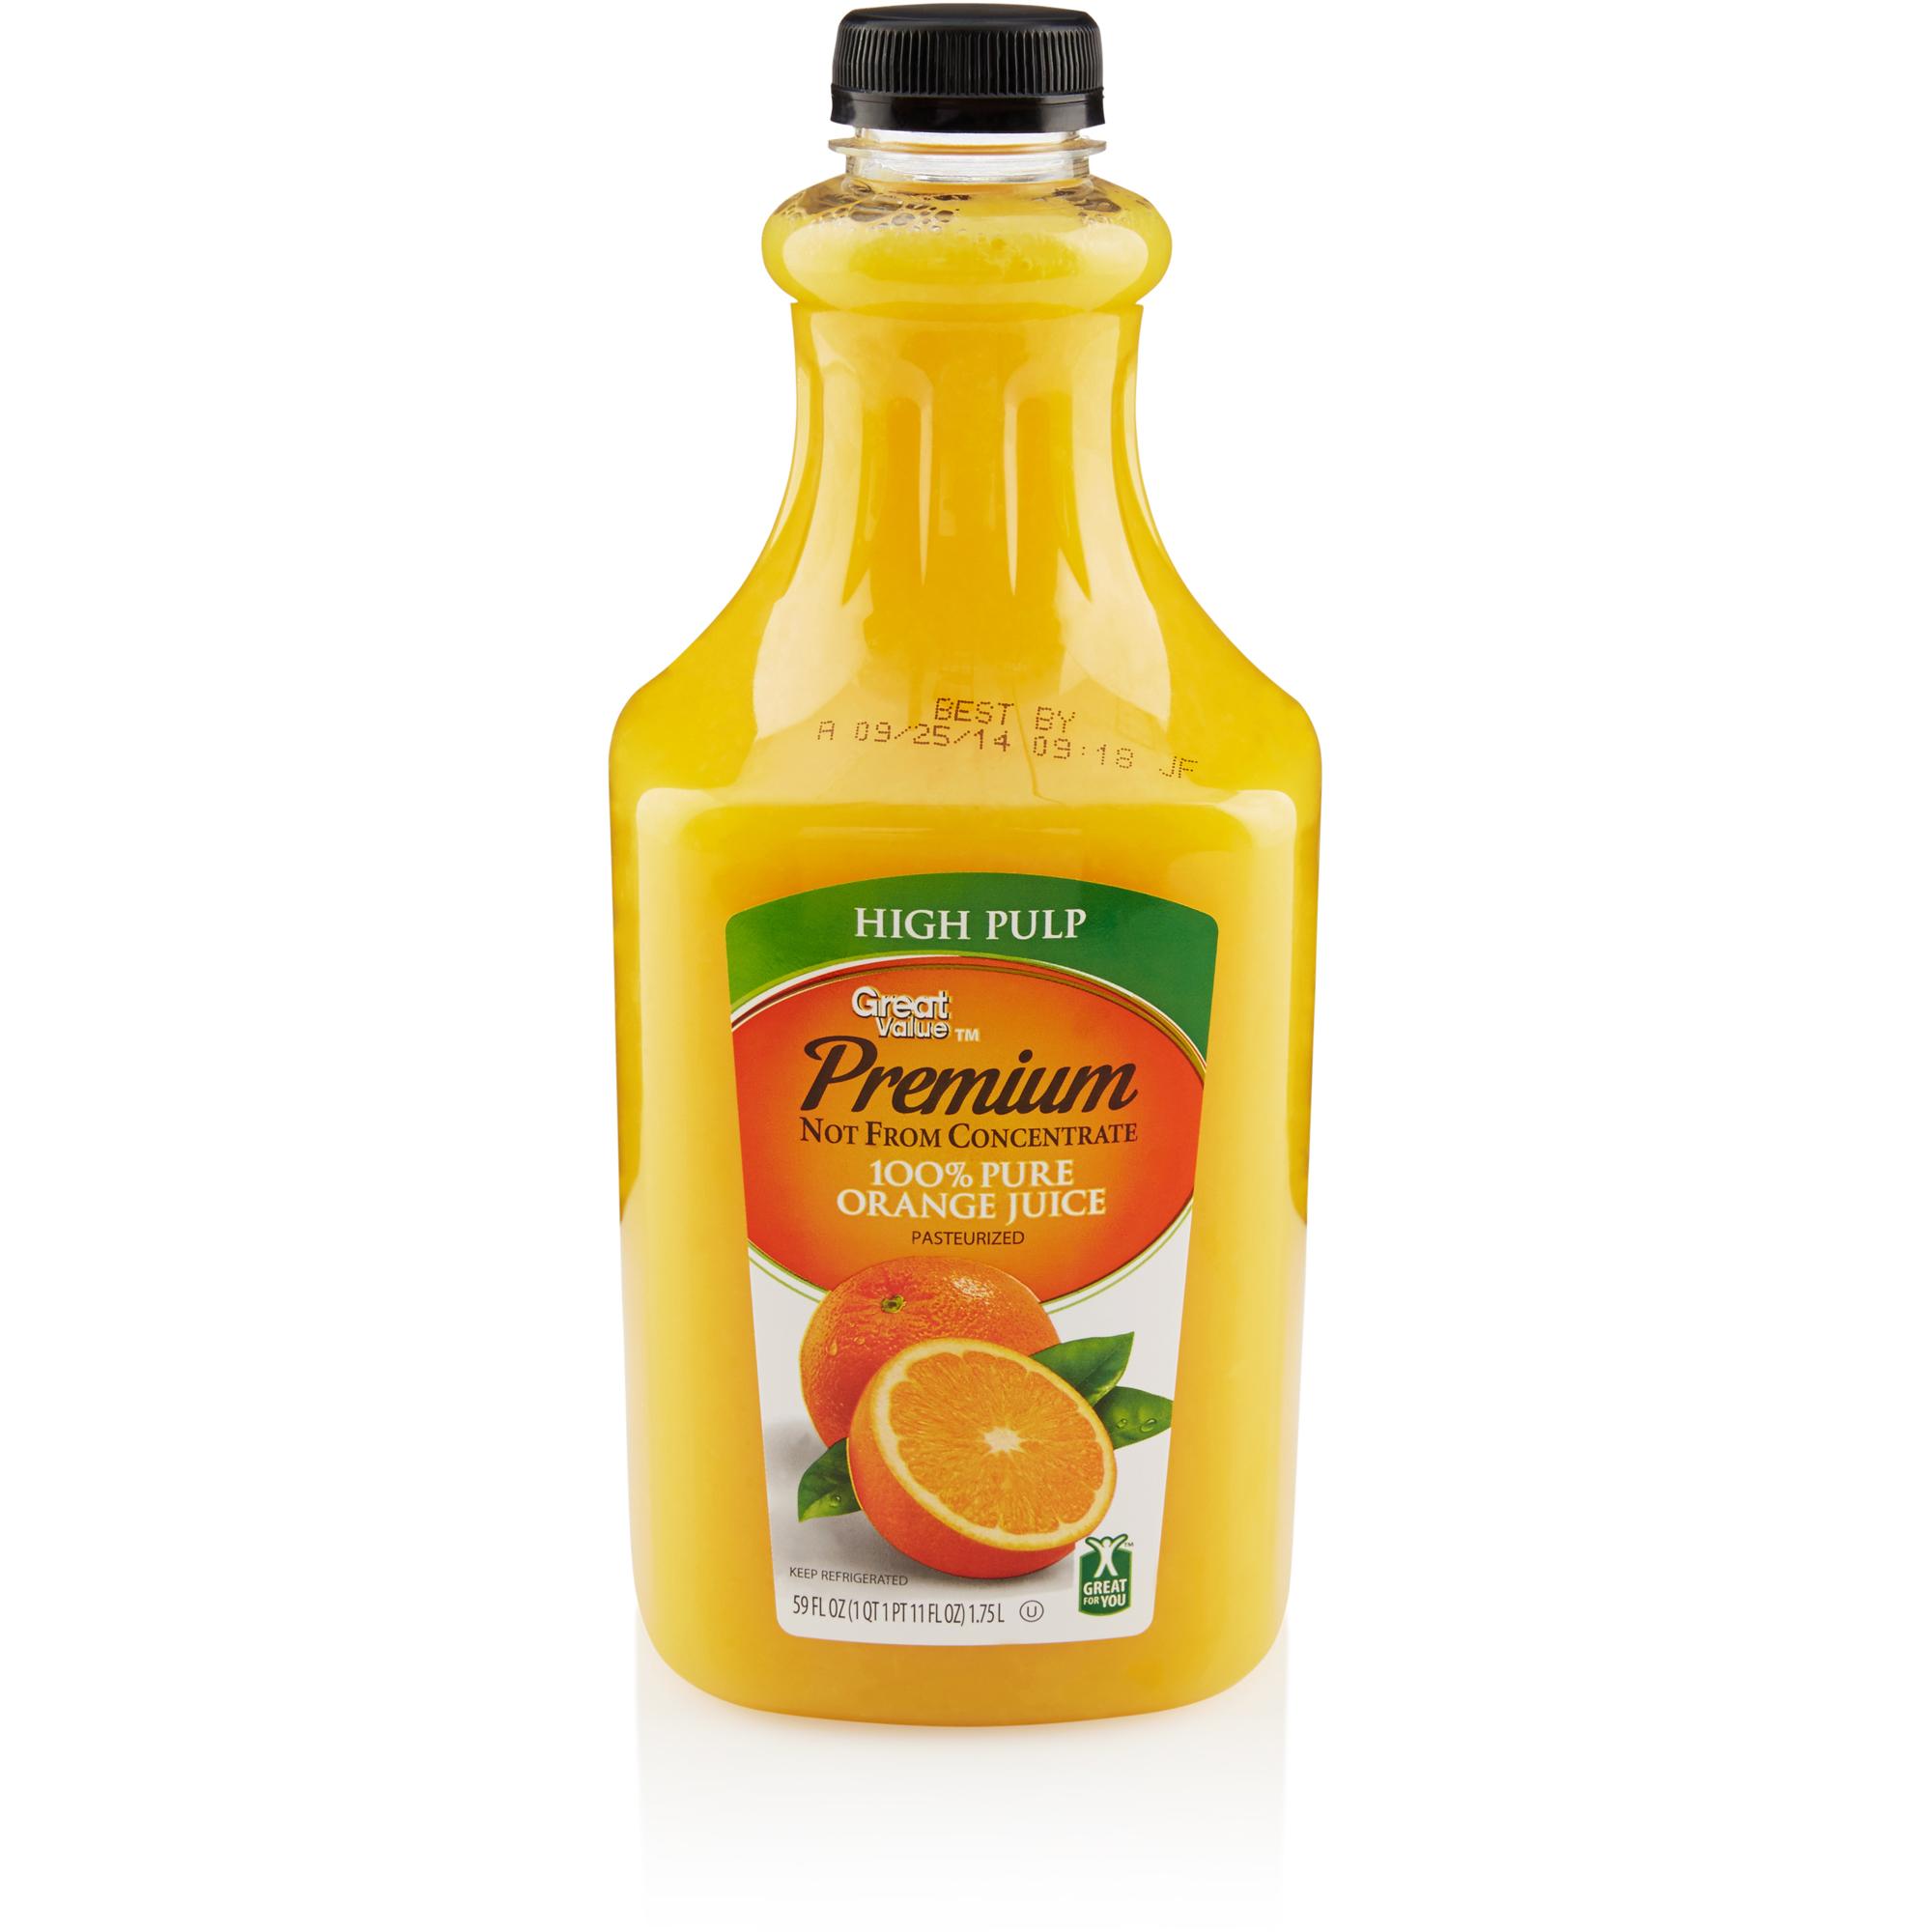 Great Value High Pulp 100% Pure Orange Juice, 59 fl oz